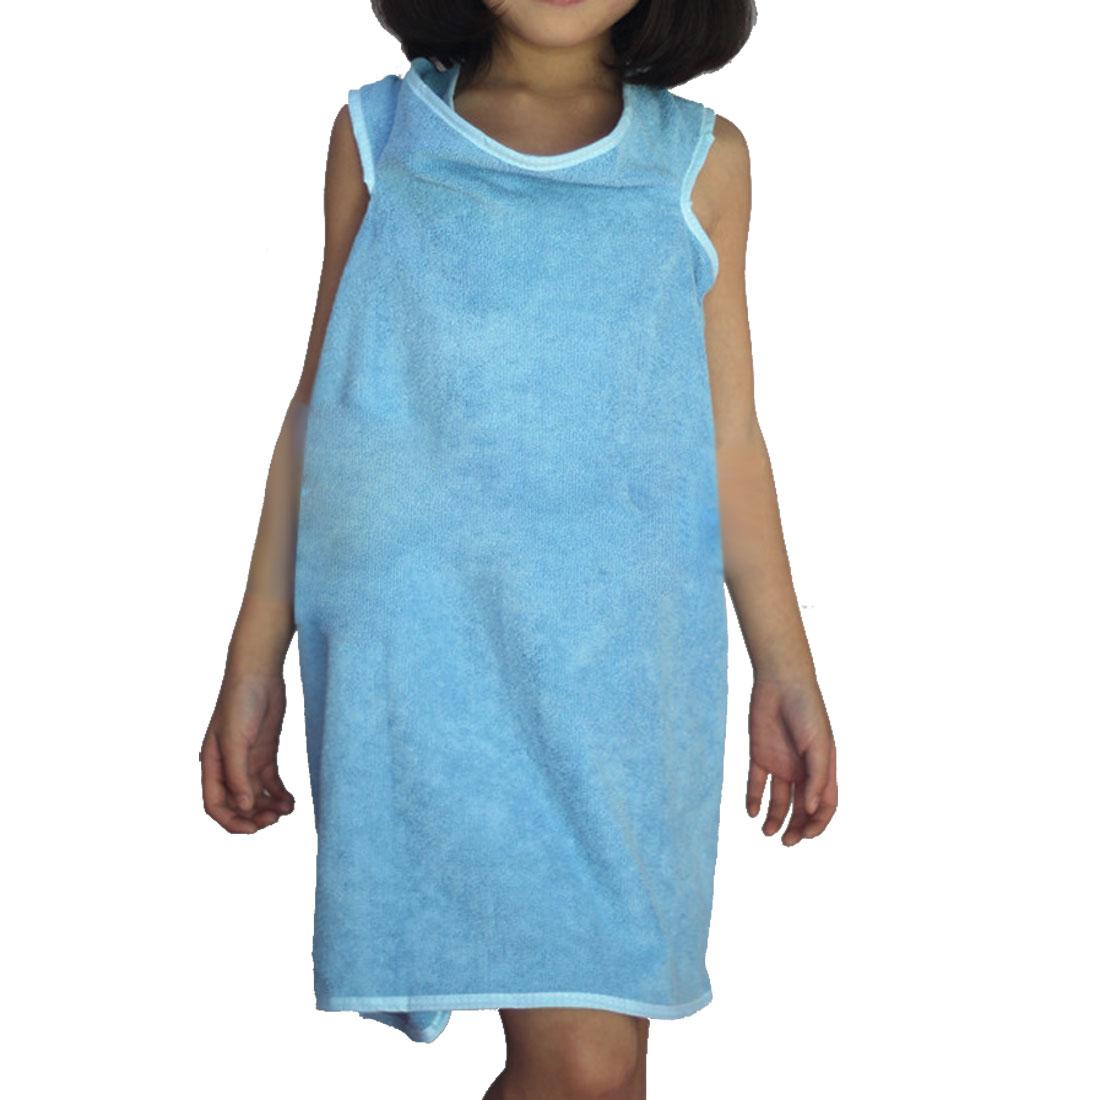 Girl Microfiber Spa Beach Swimming Shower Bath Towel Wrap Skirt Washcloth Blue